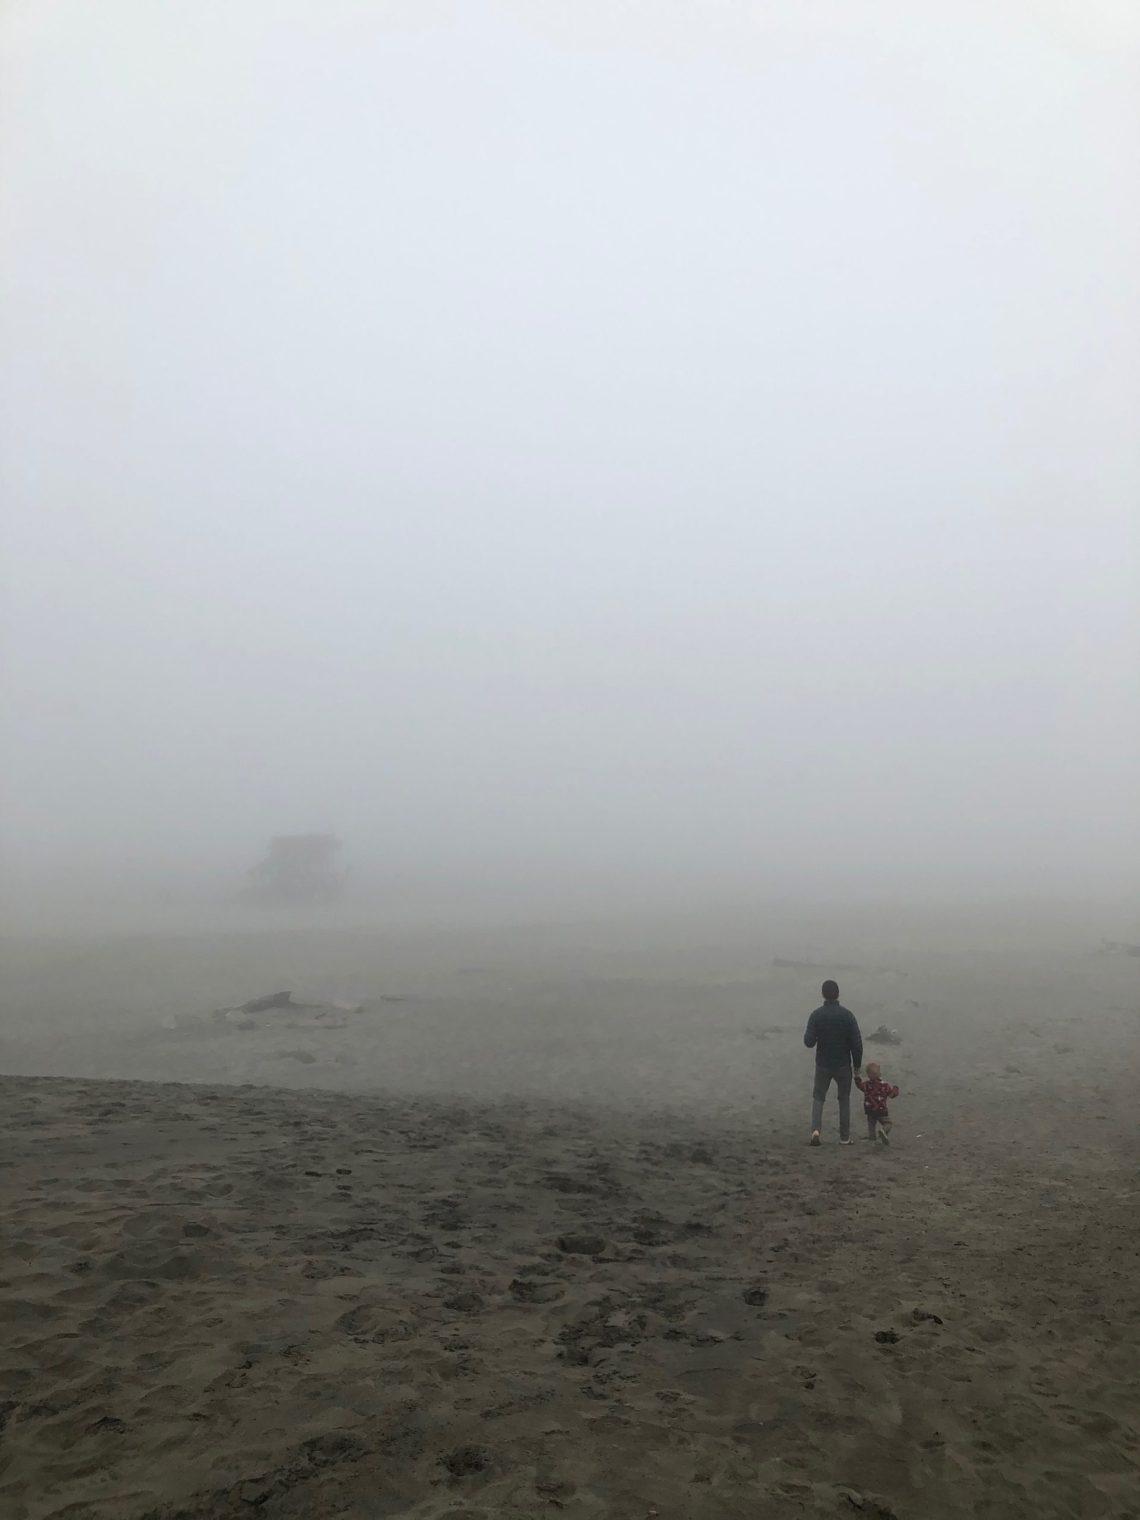 Peter Iredale Fog at Oregon coast - Fort Stevens camping